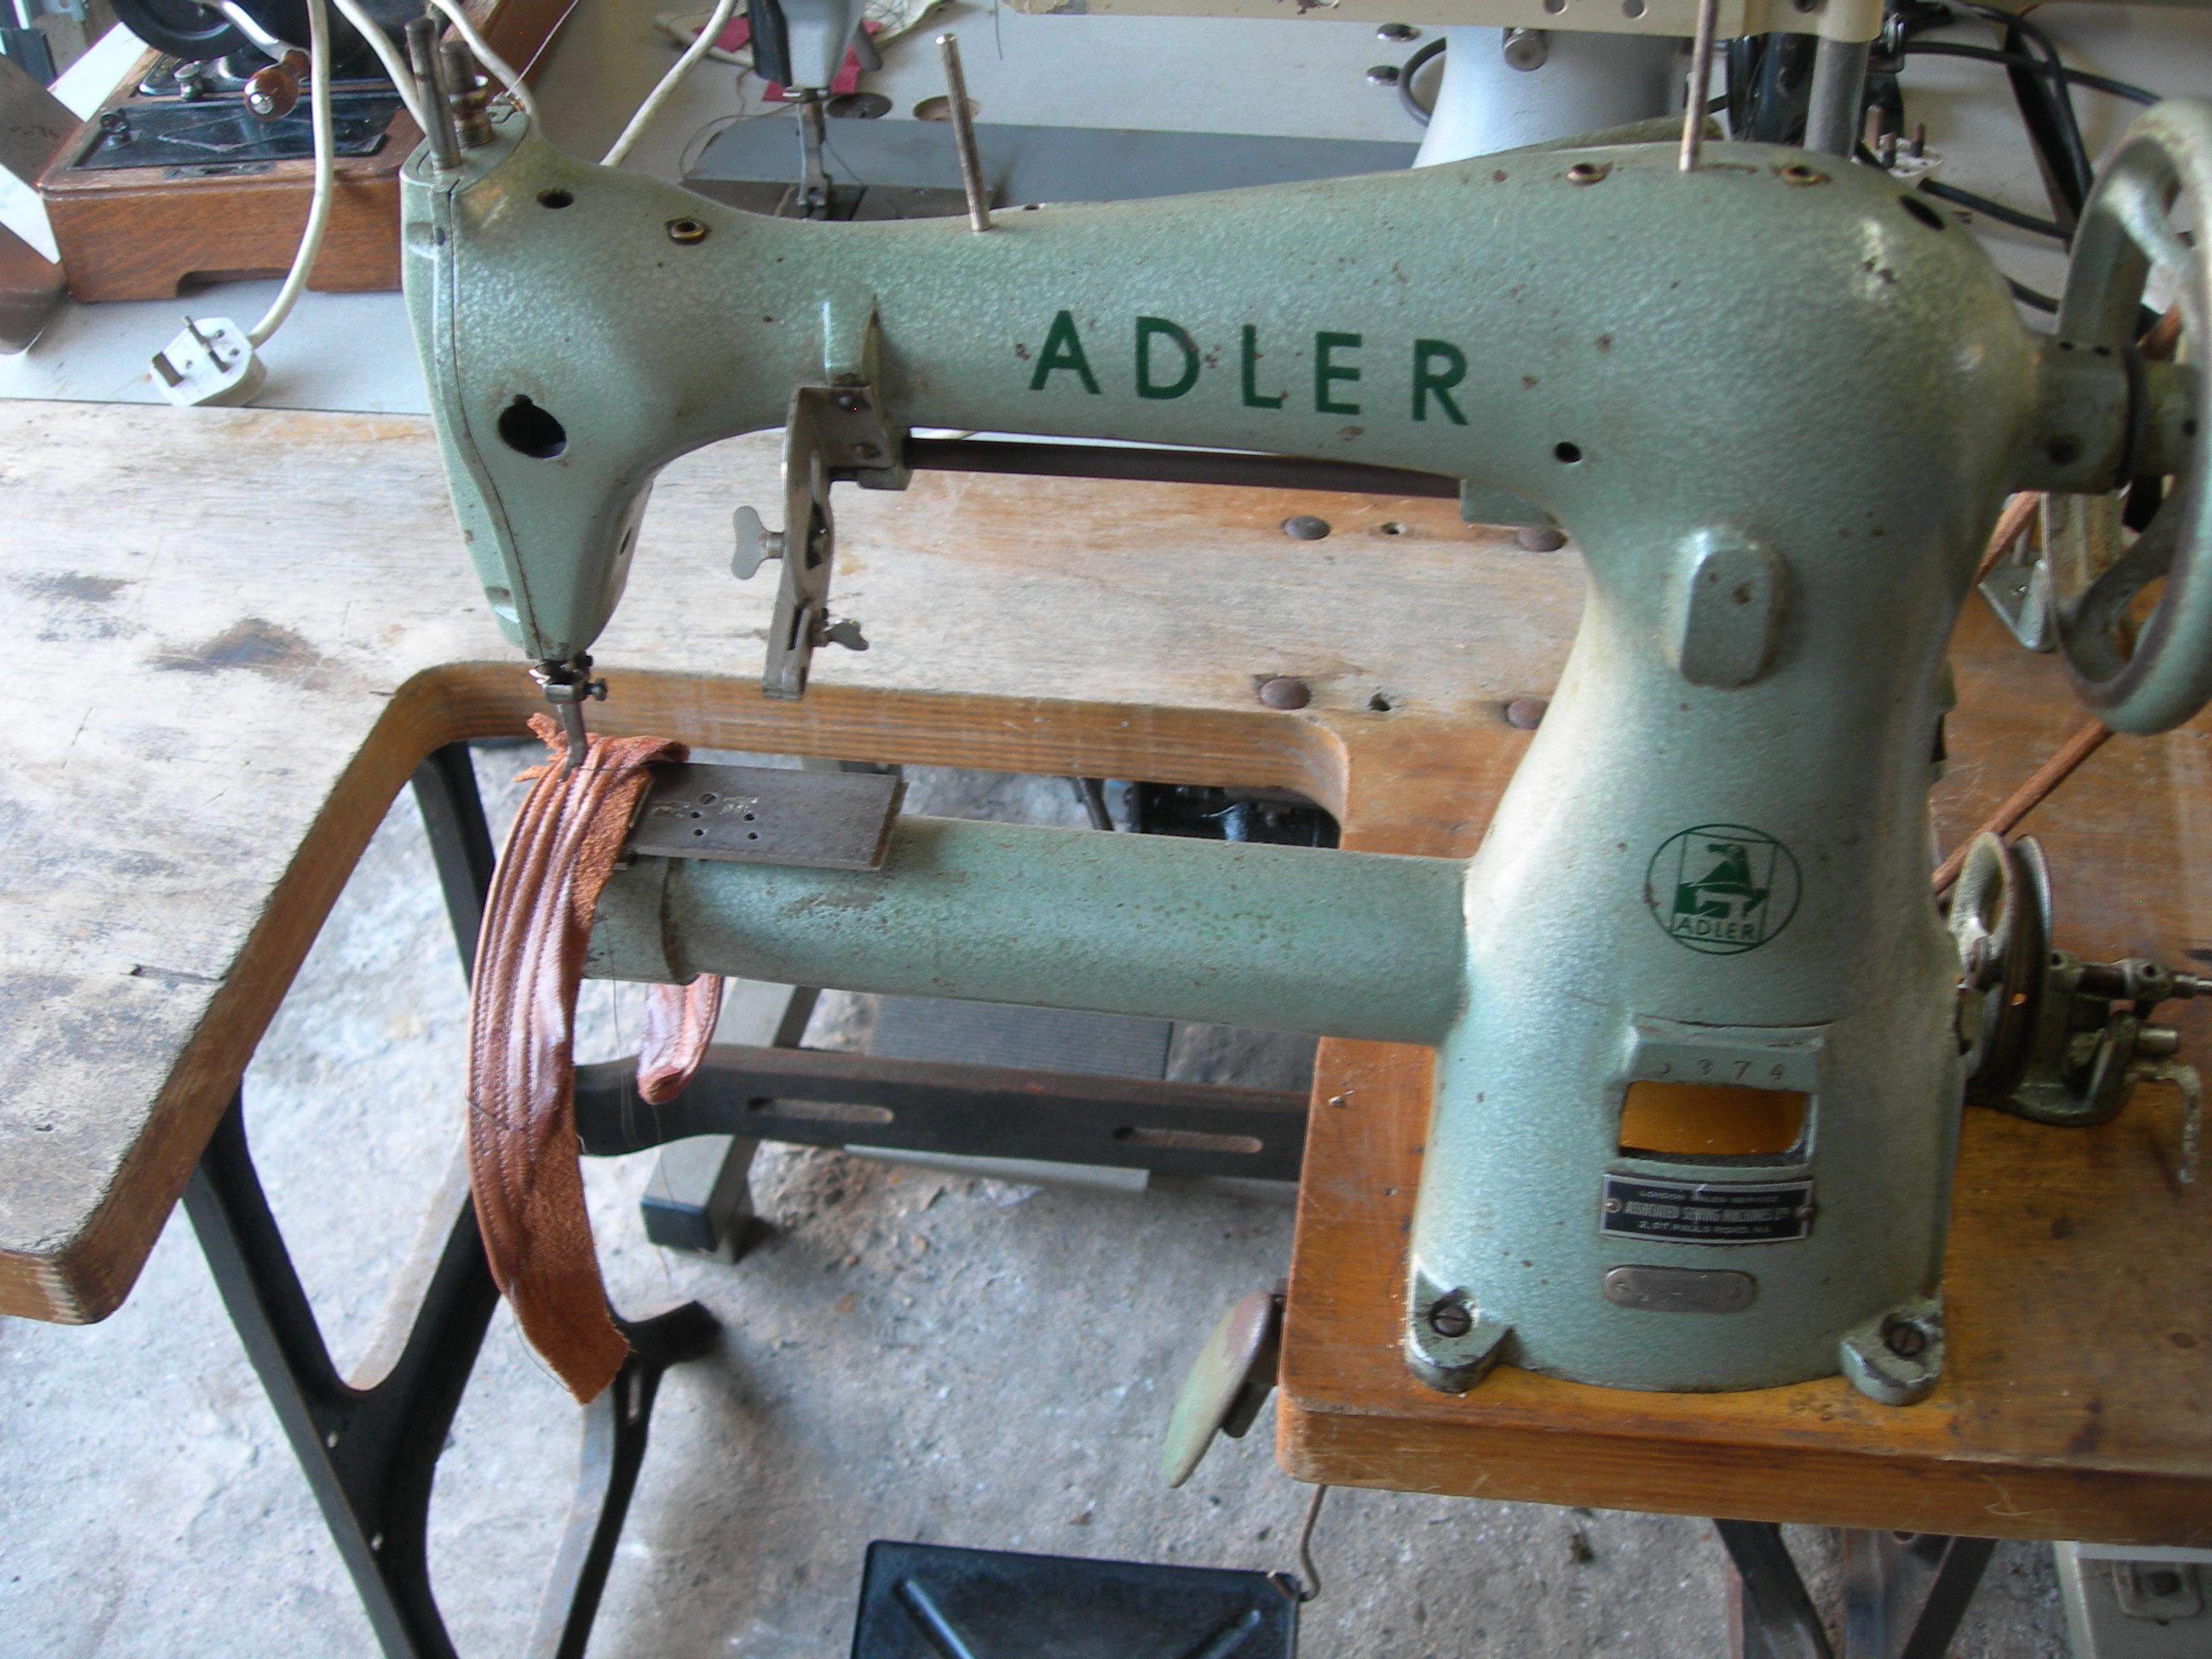 adler cylinder arm sewing machine